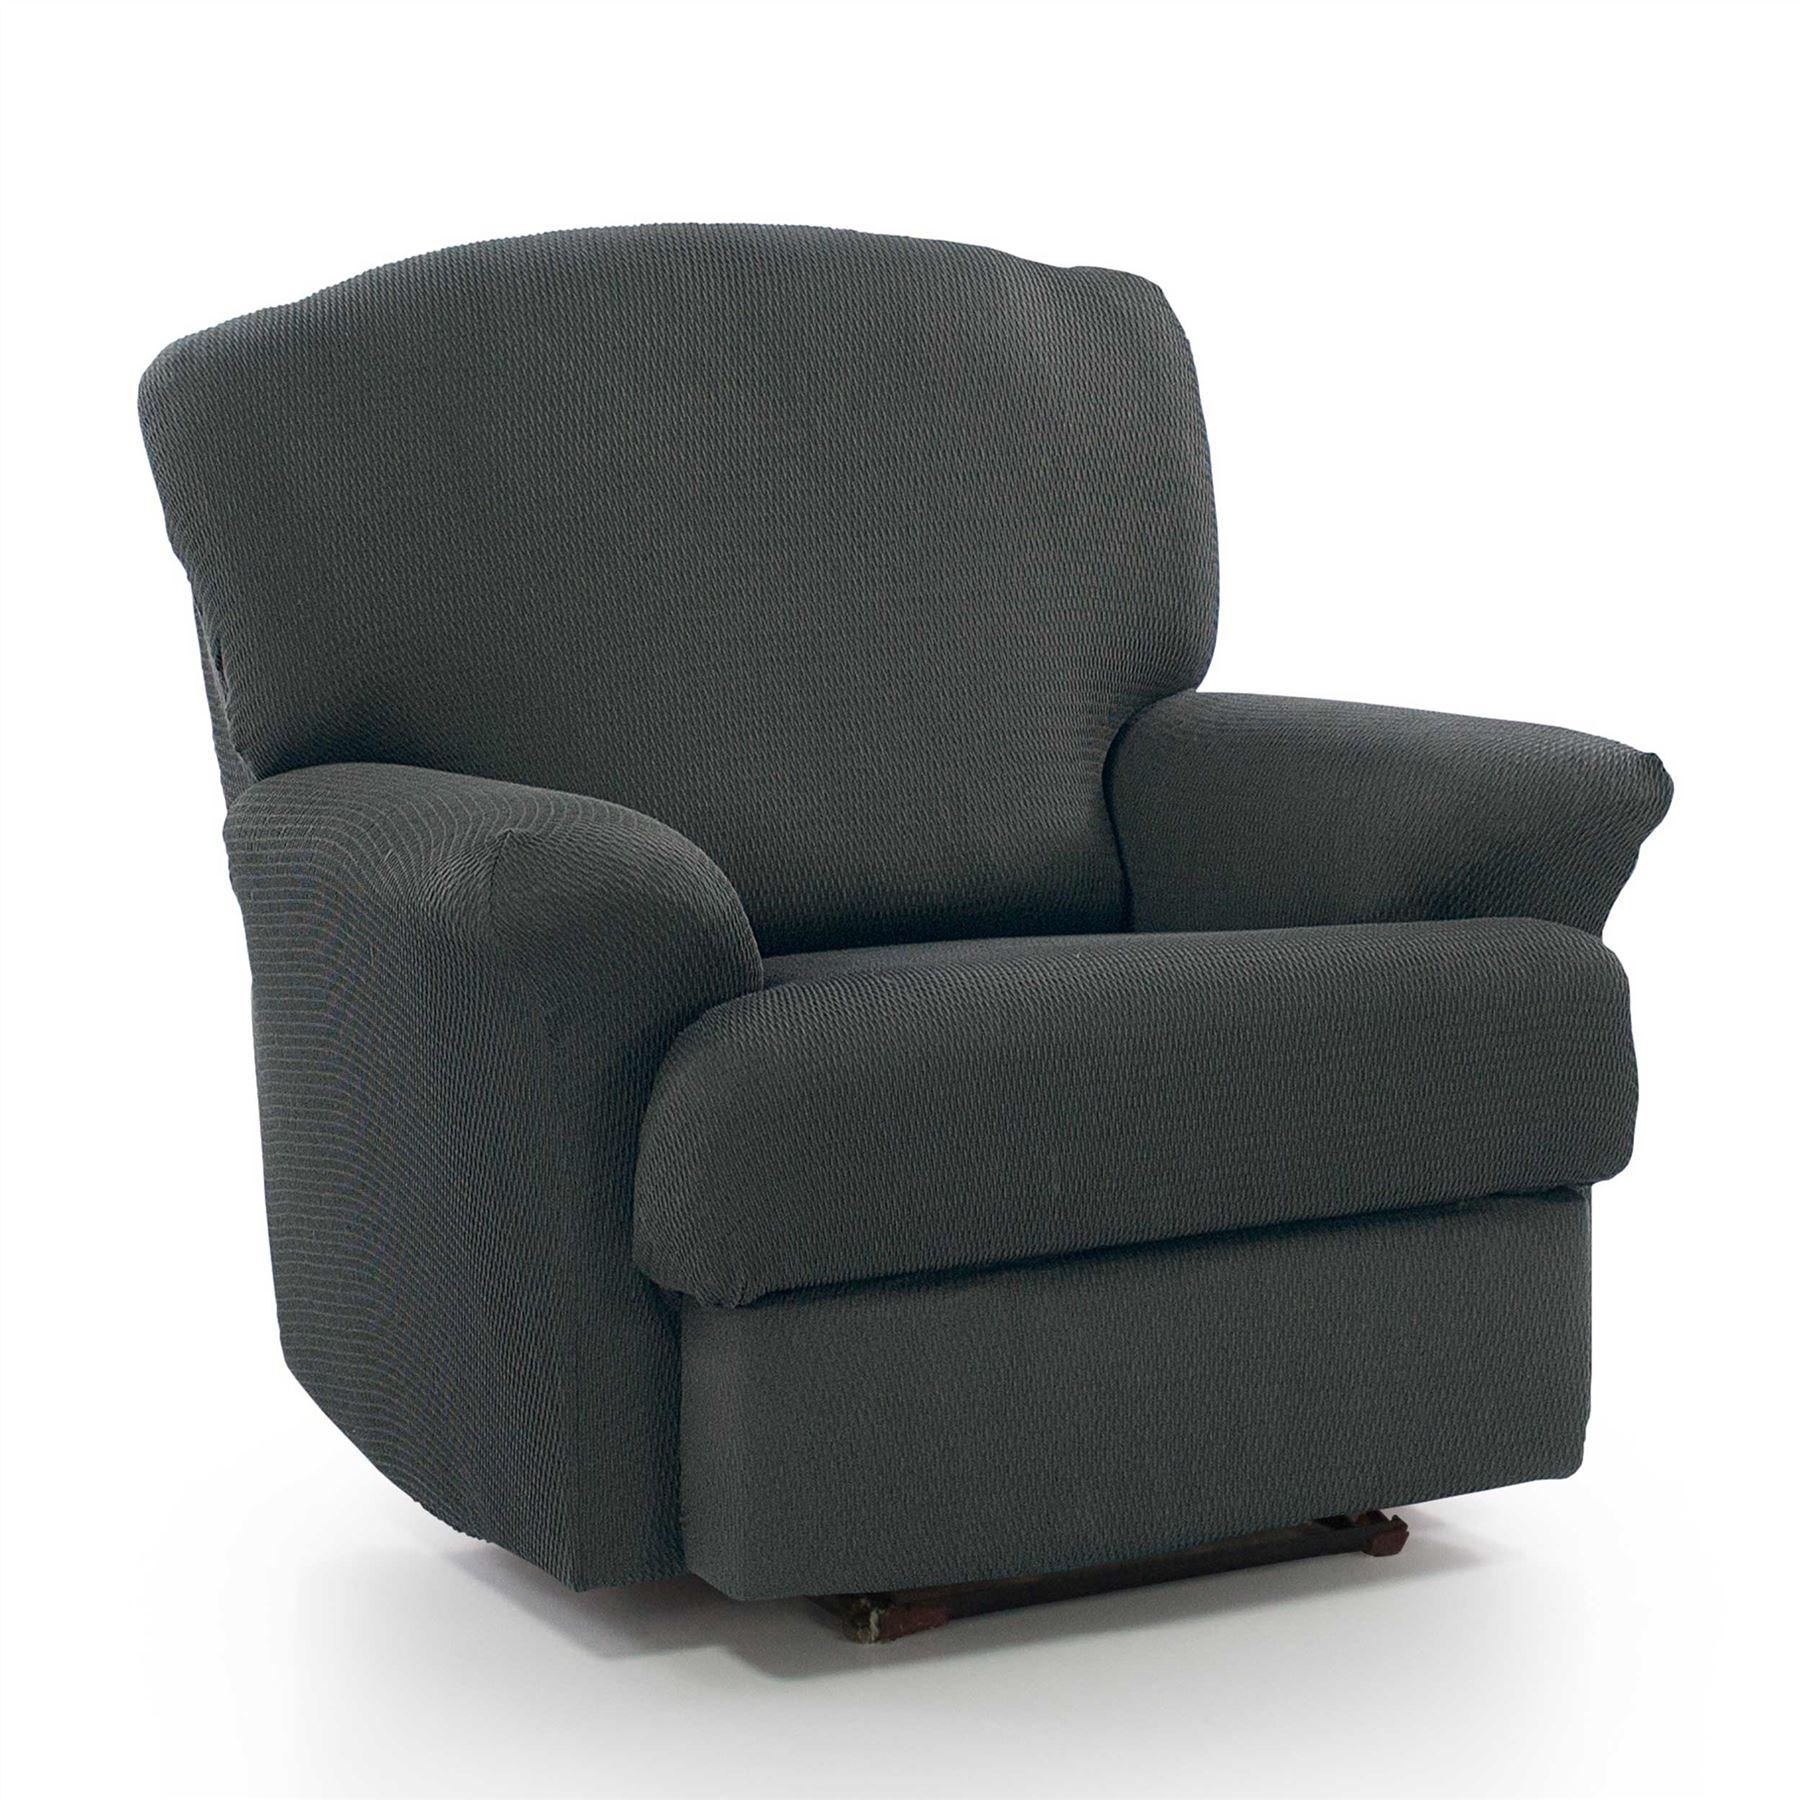 sofa fabric guard www fantasticfurniture com au sofas 1 seater recliner armchair slipcover stretch elastic